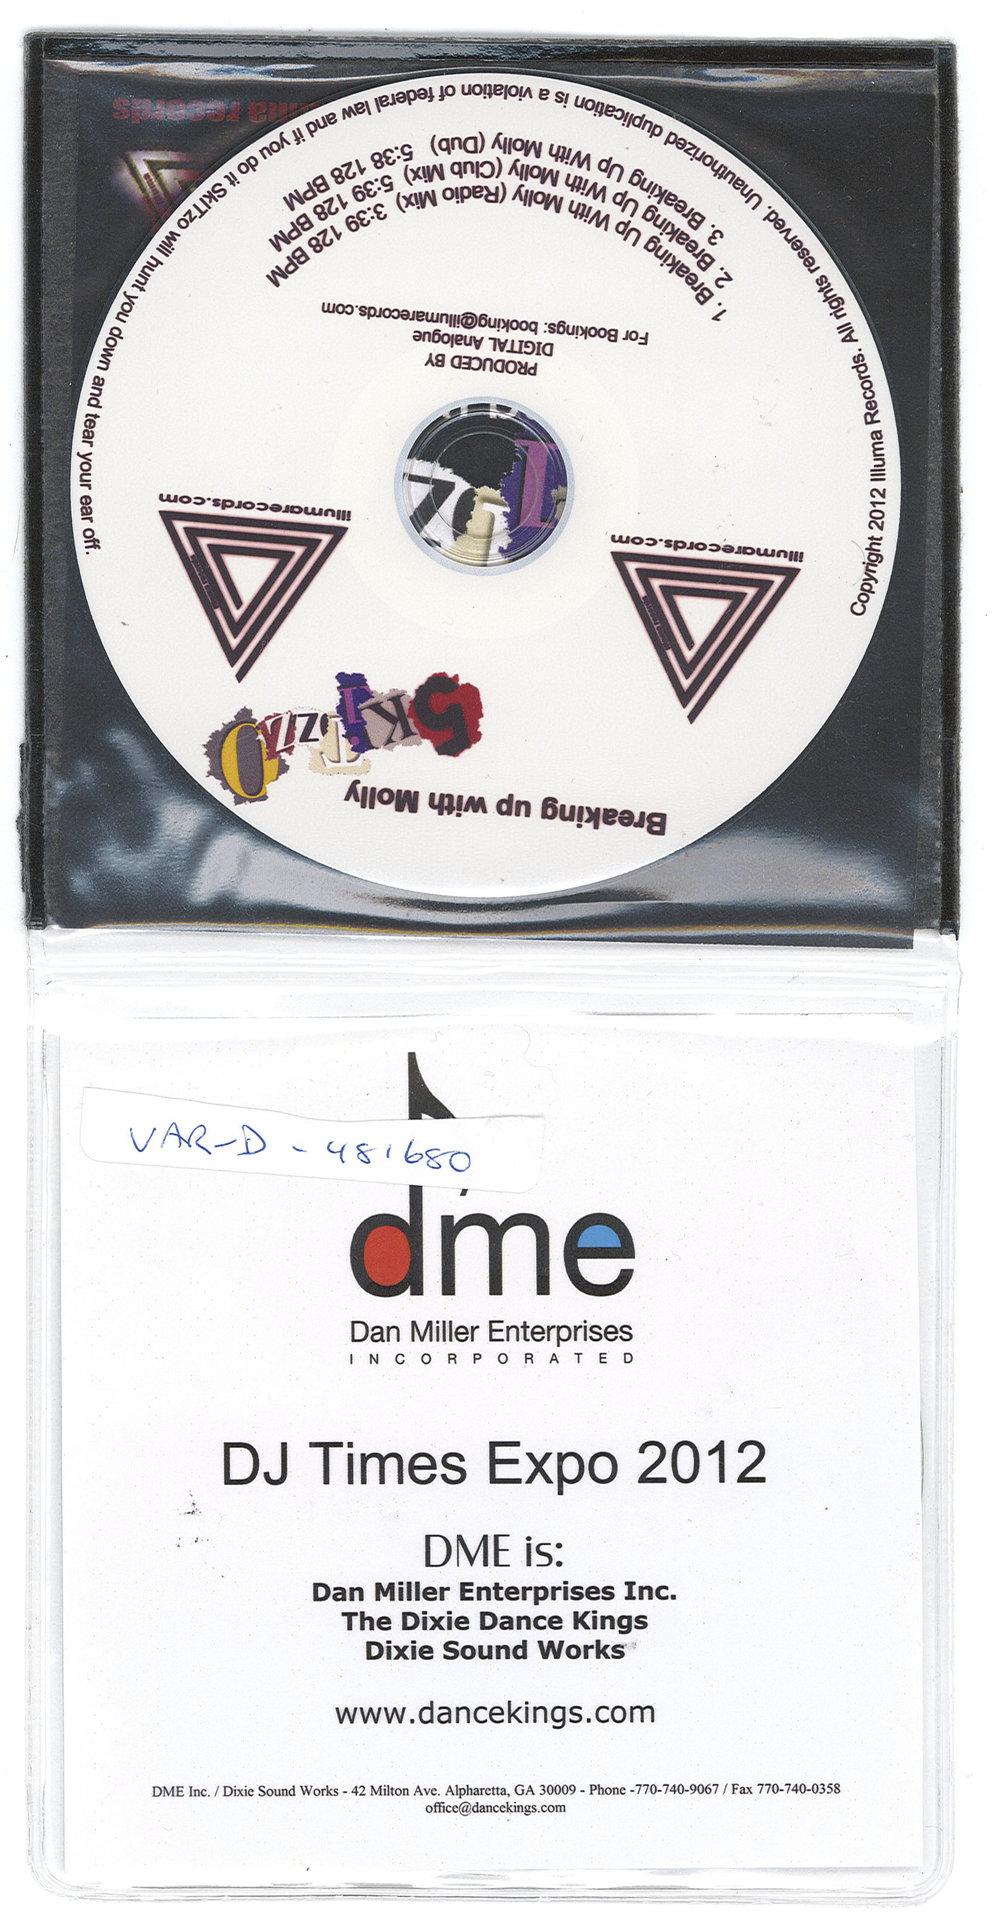 WLWLTDOO-2012-CD-DJ_TIMES-CDR.jpg